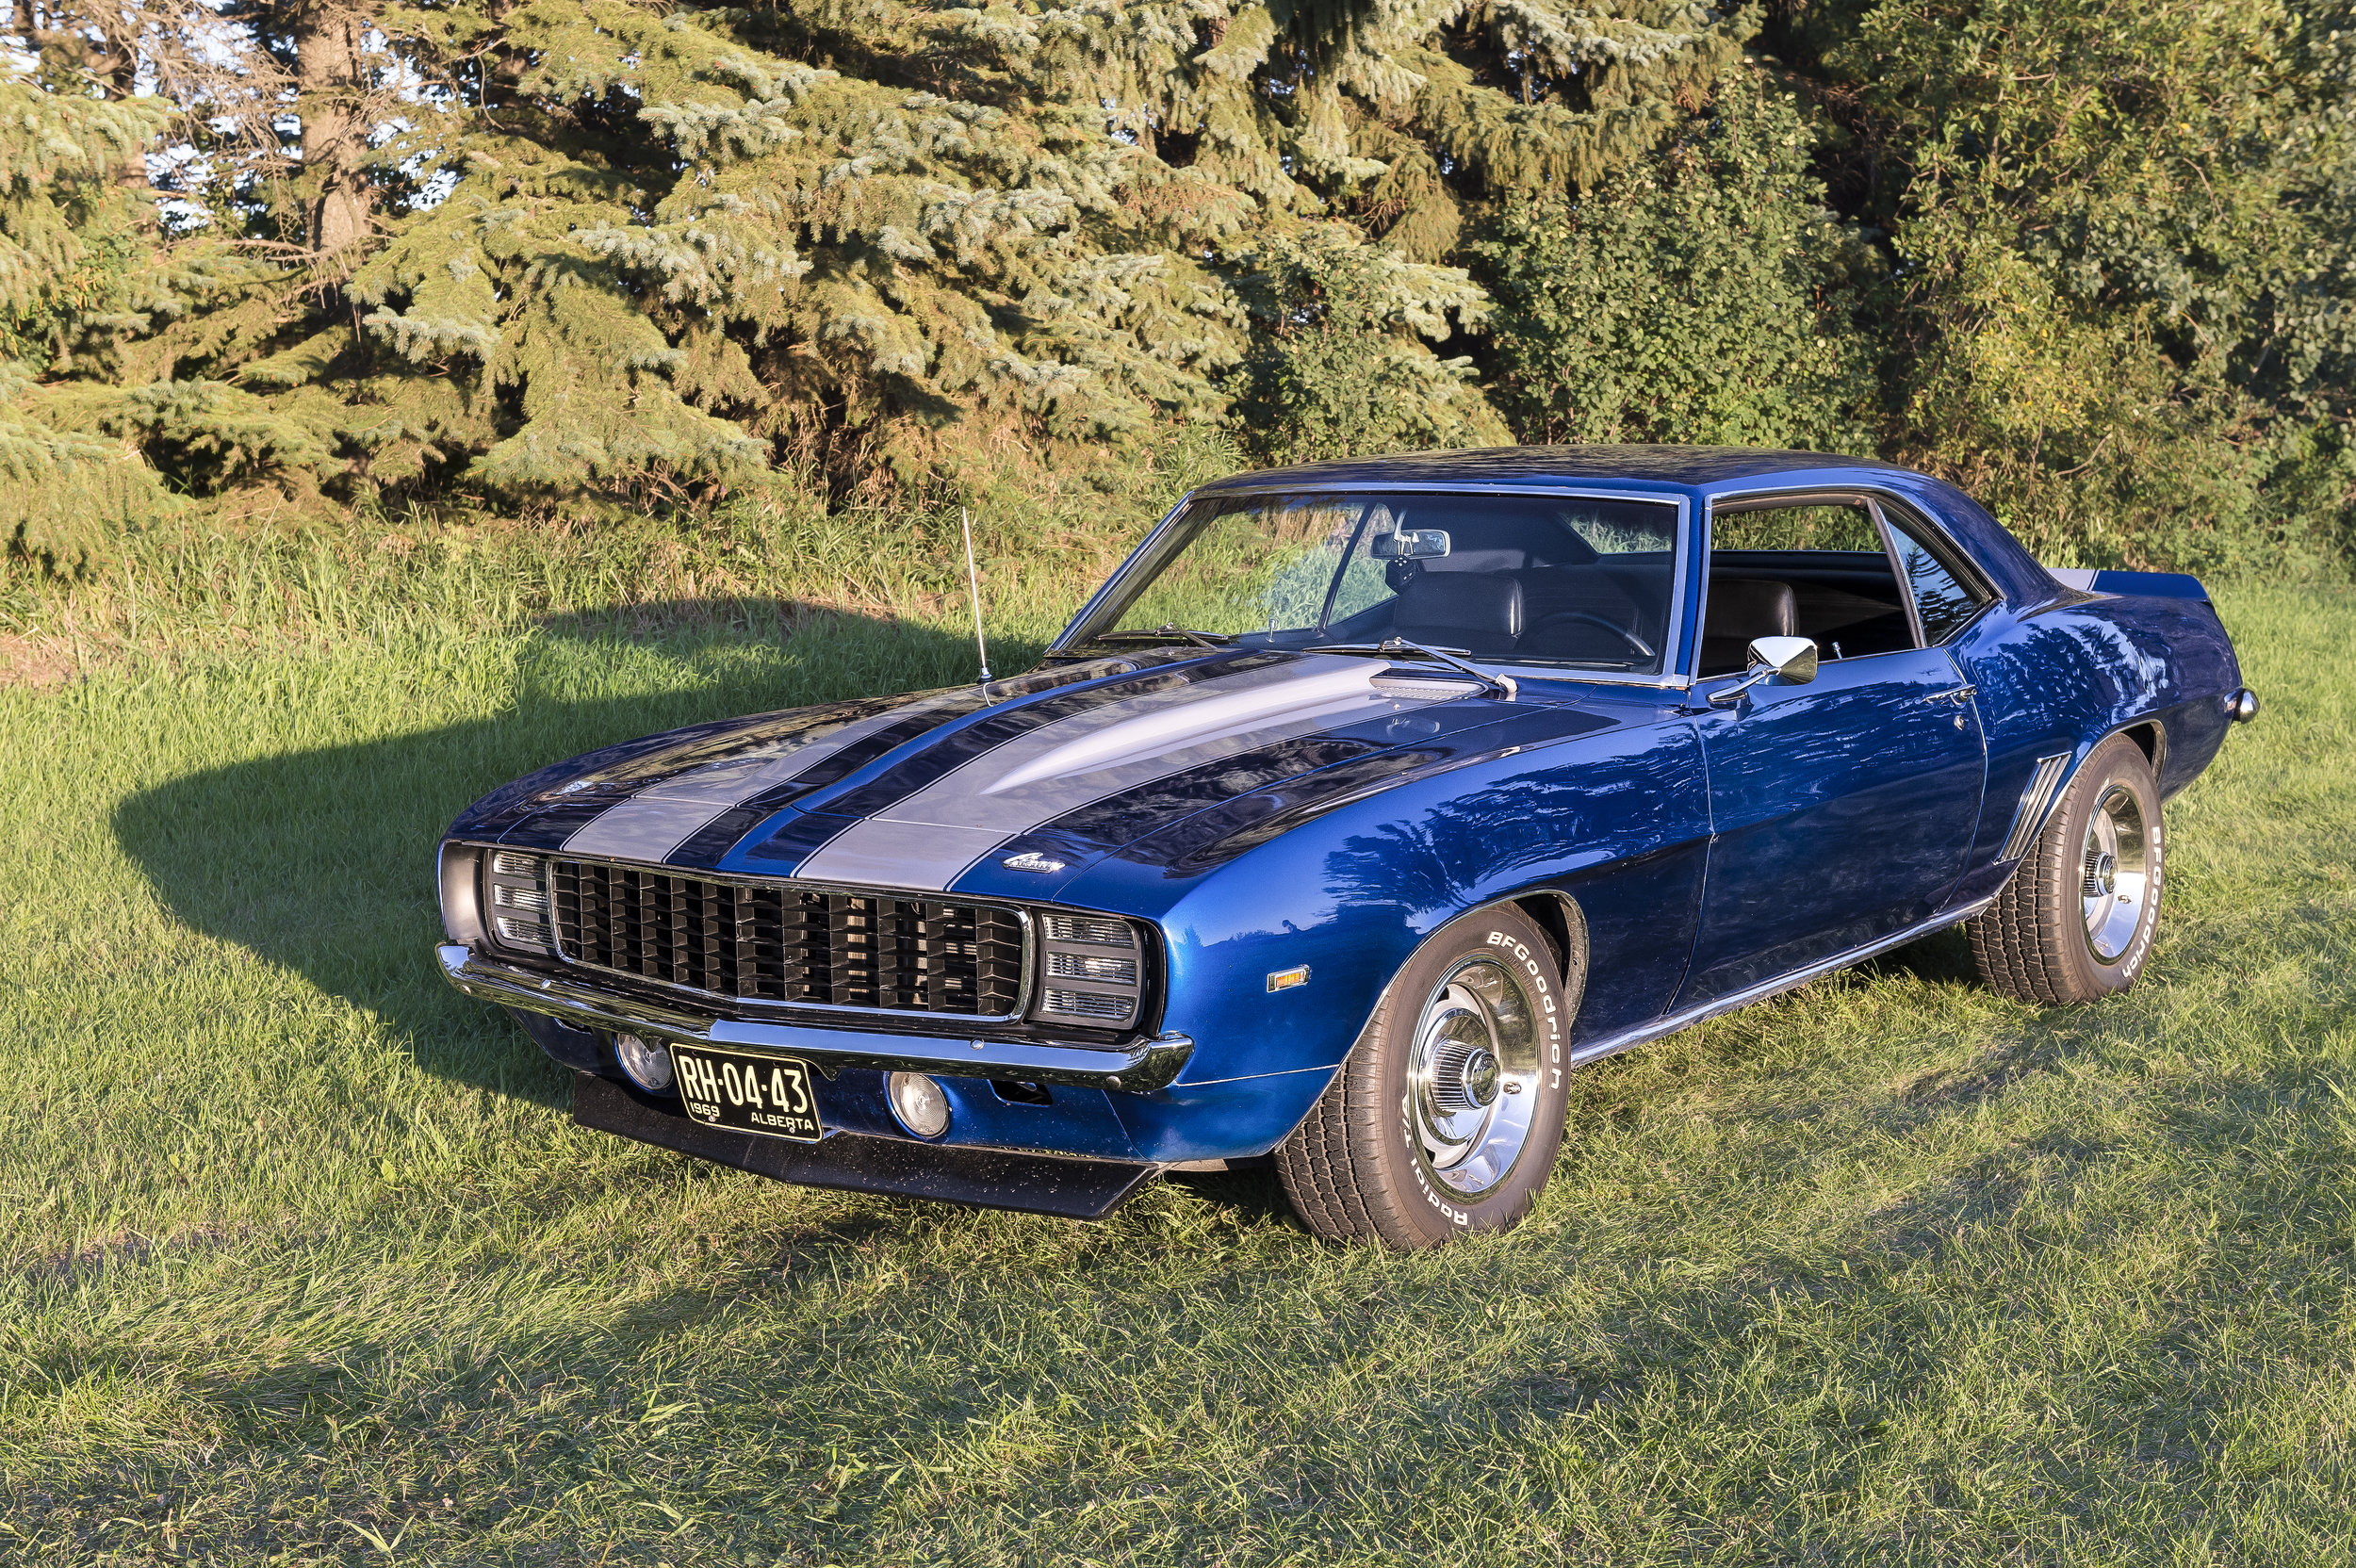 1969 Camaro RS  383 stroker, 700 r4, 10 bolt posi 383 gears, willwood brakes, all original sheet metal car from Texas.